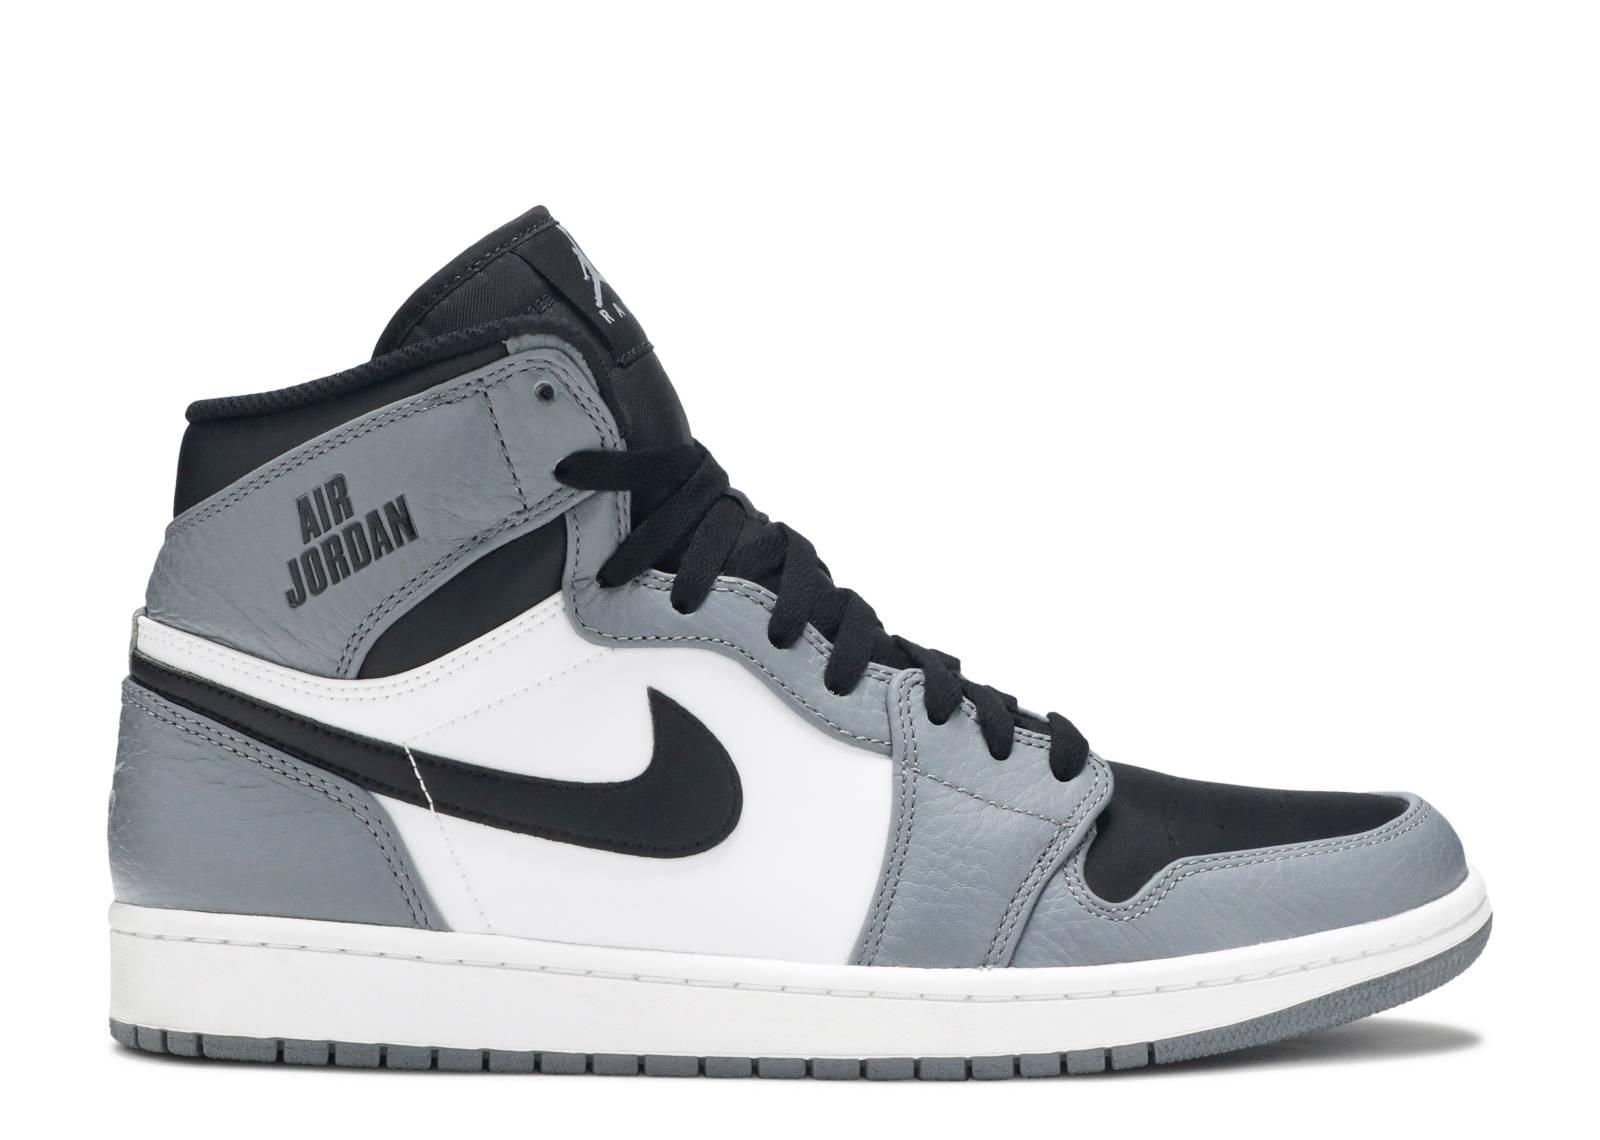 Air Jordan 1 Rare Air 'Cool Grey'